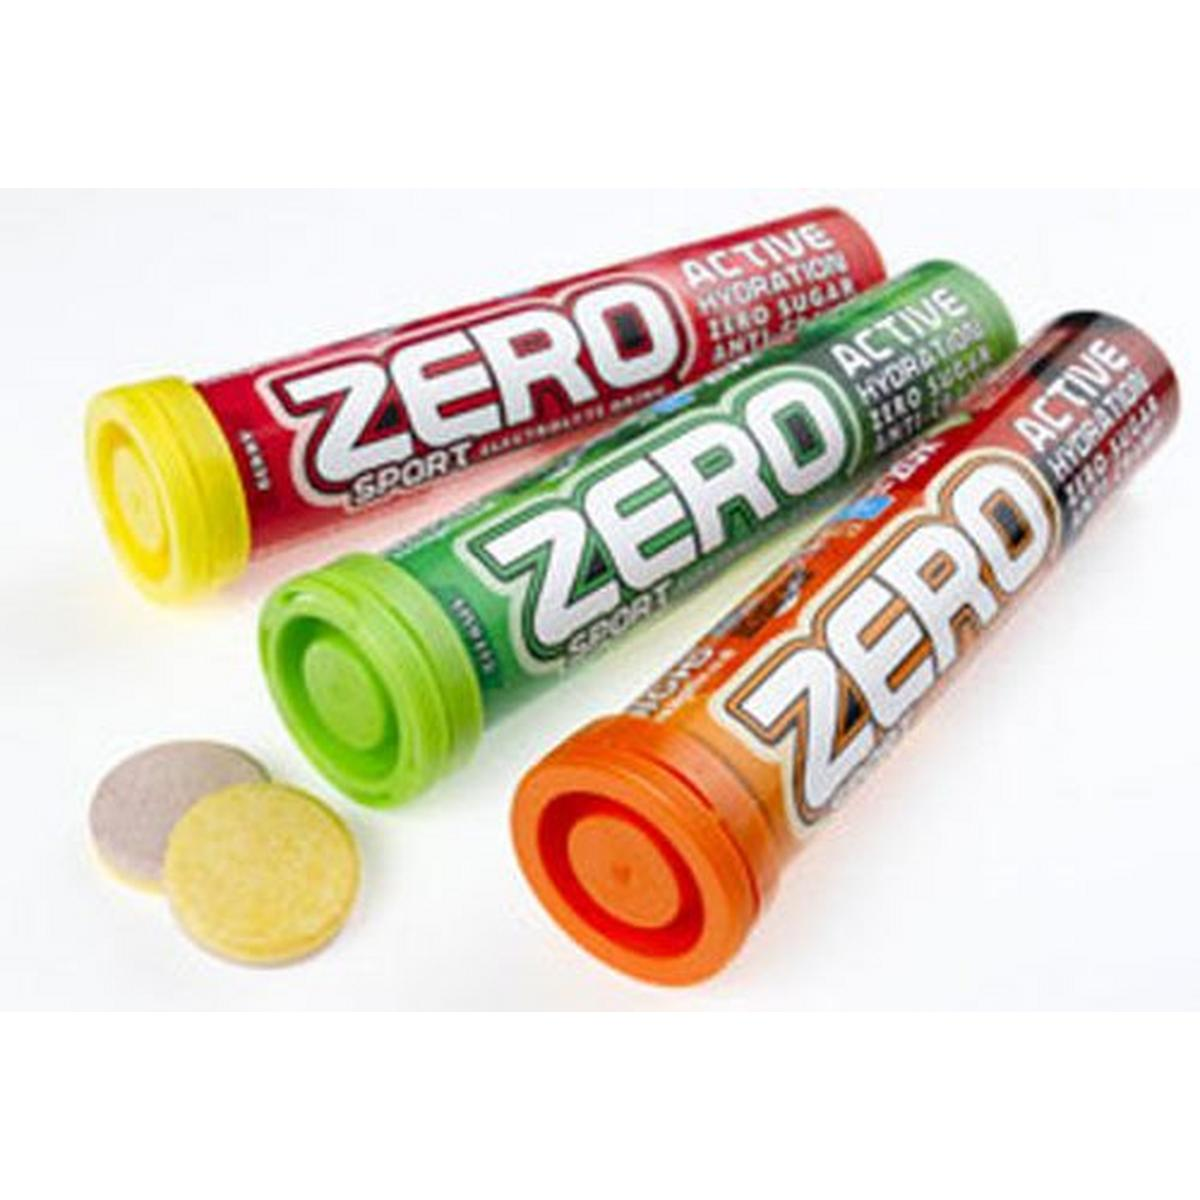 High Five H5 Zero Active Hydration 20 Tablet Tube Citrus